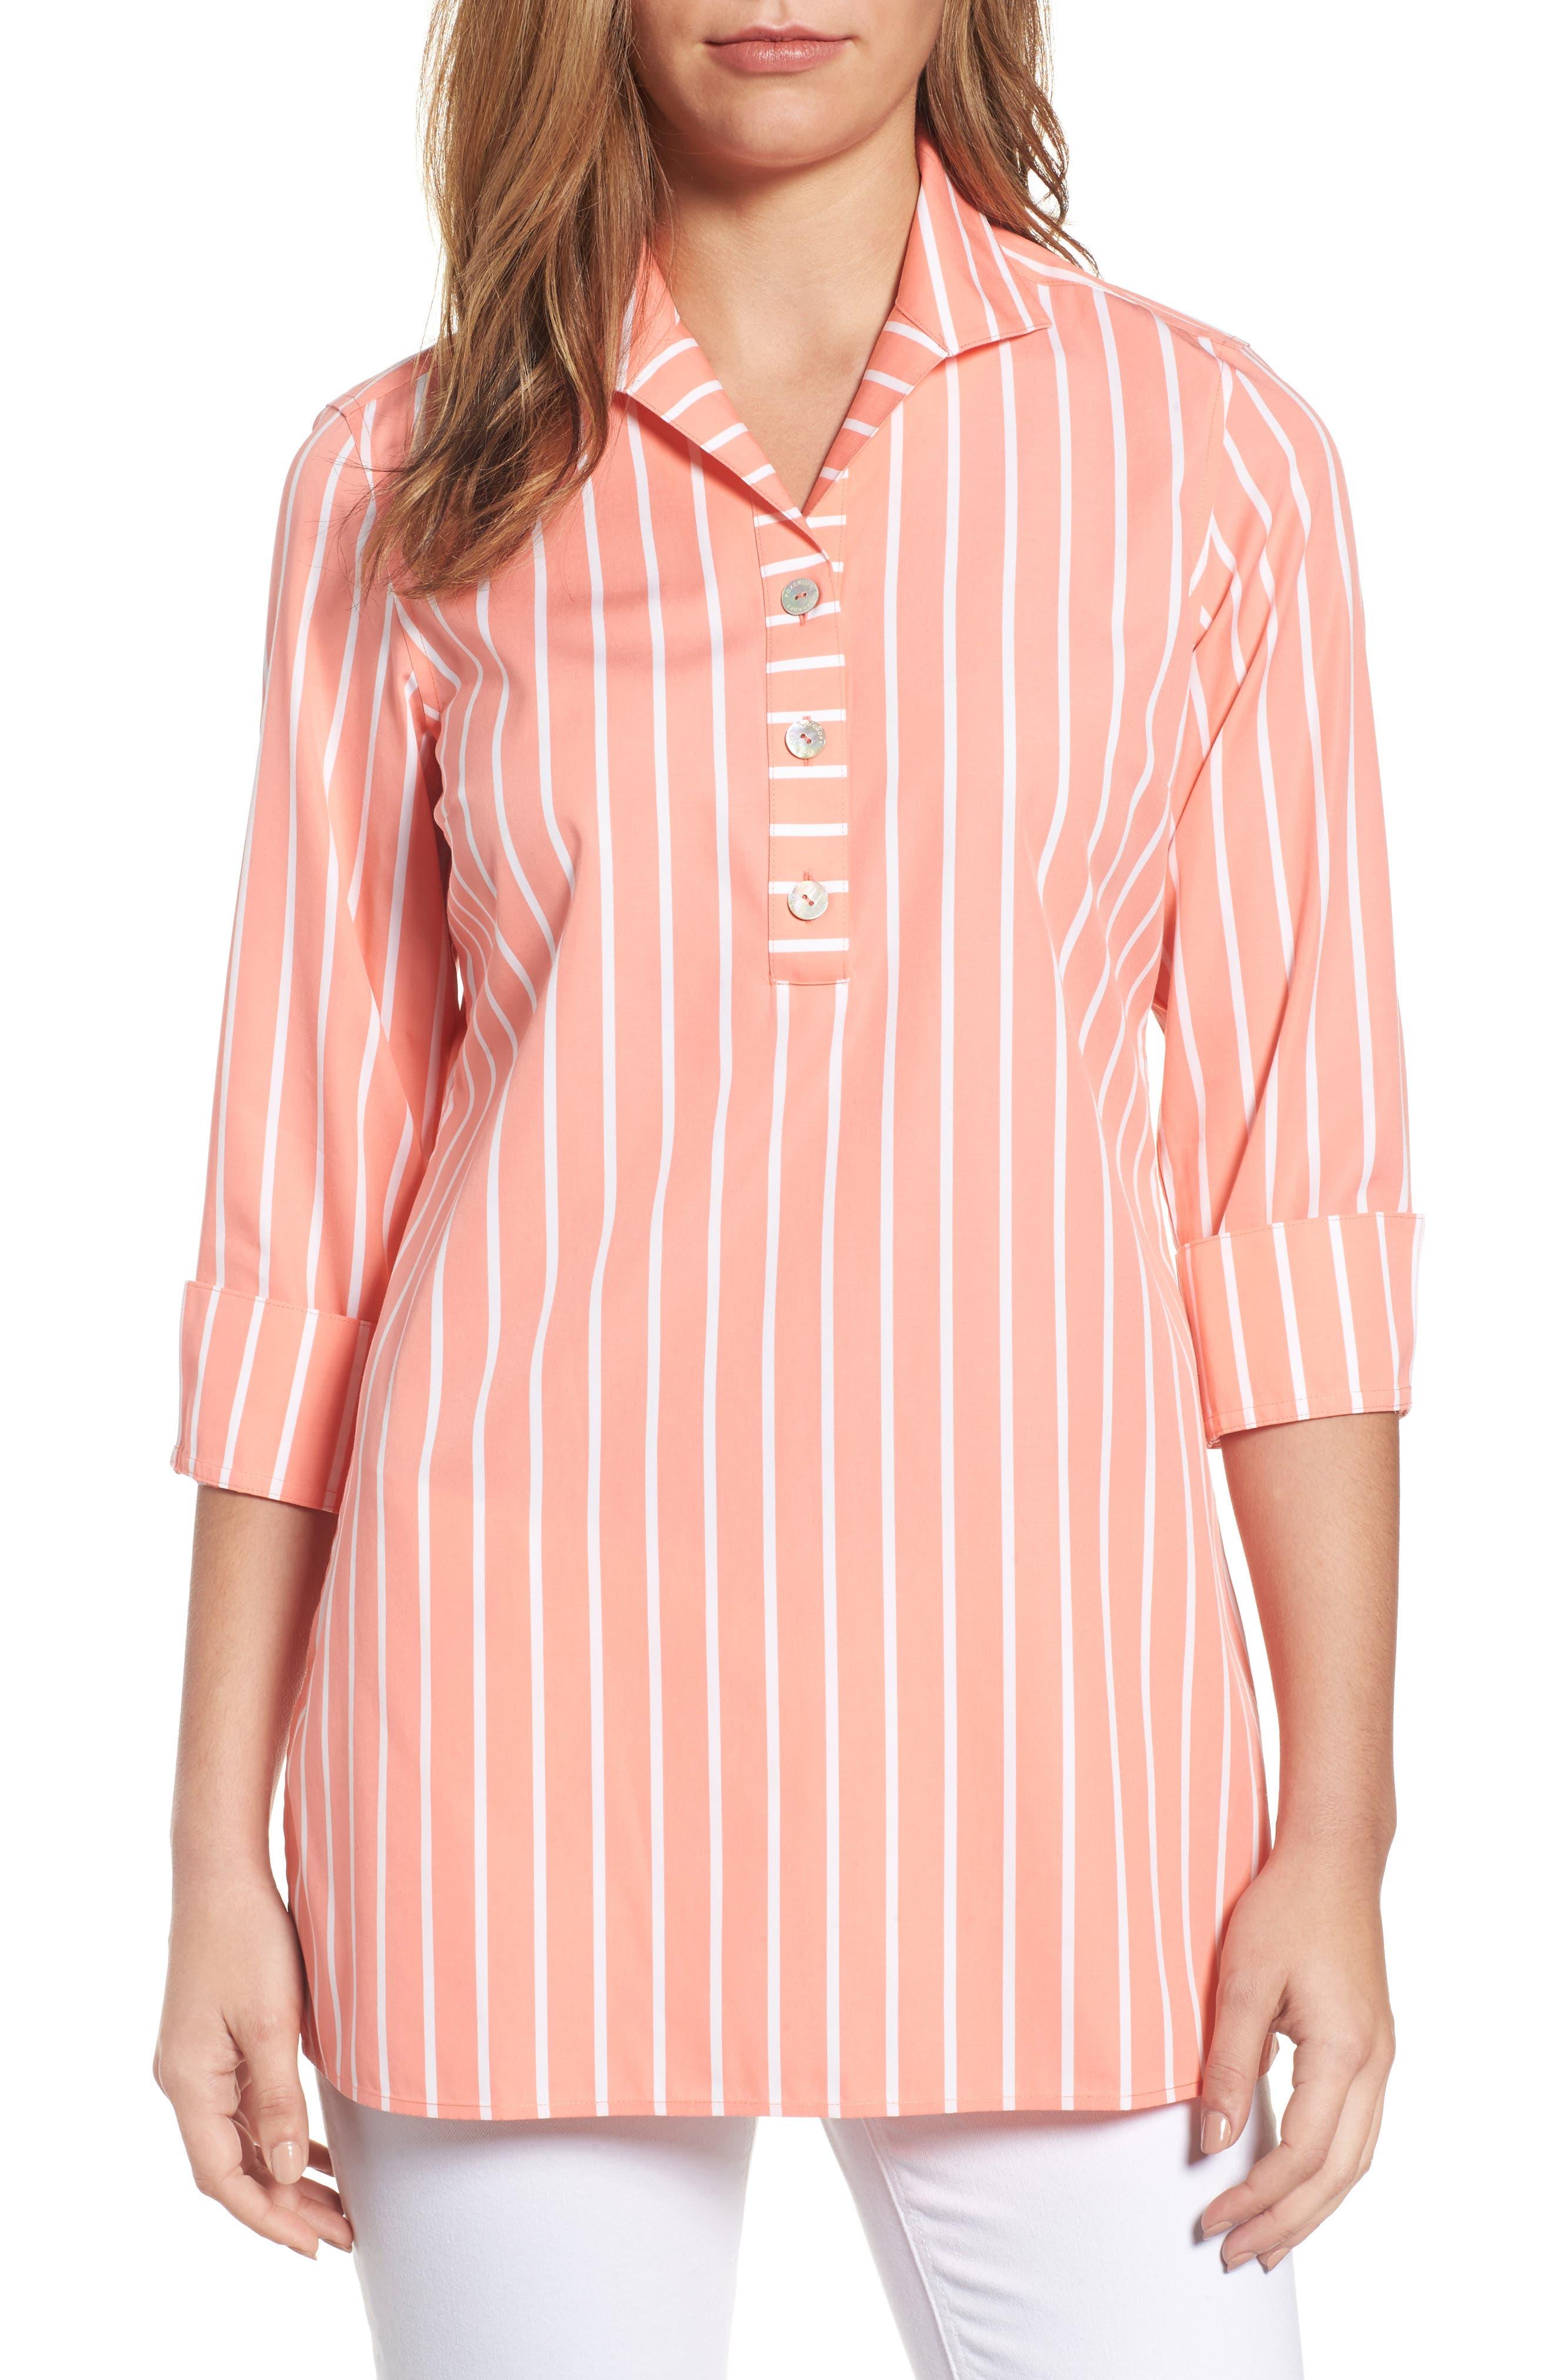 Alternate Image 1 Selected - Foxcroft Dani Button Back Tunic Shirt